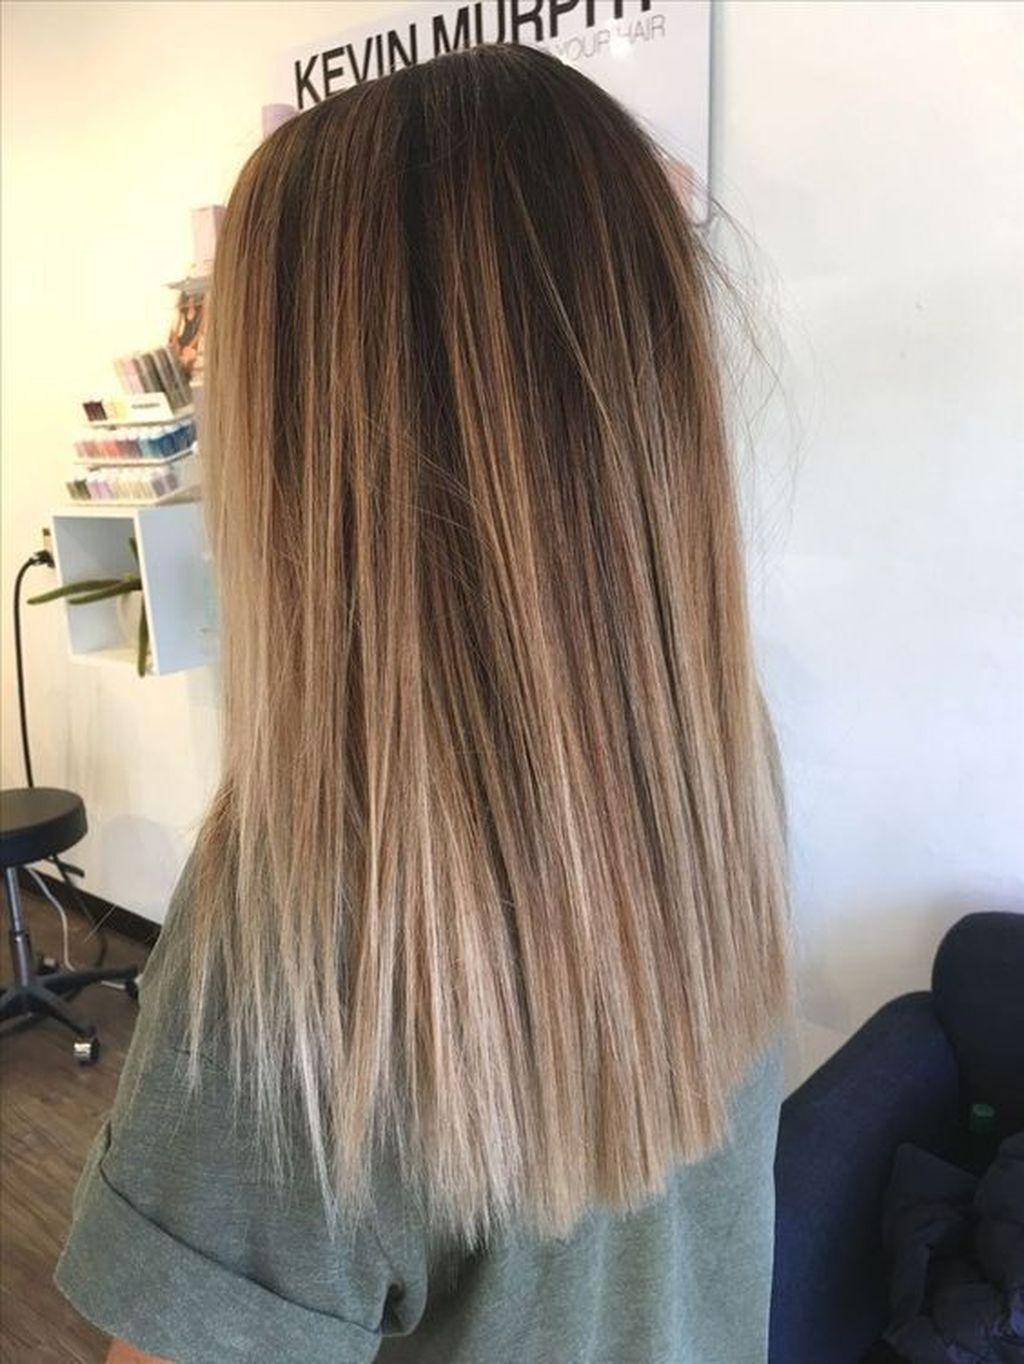 40 Cute Long Hairstyles Ideas For Women To Try In 2019 Kleur Haar Bruin Haar Haar